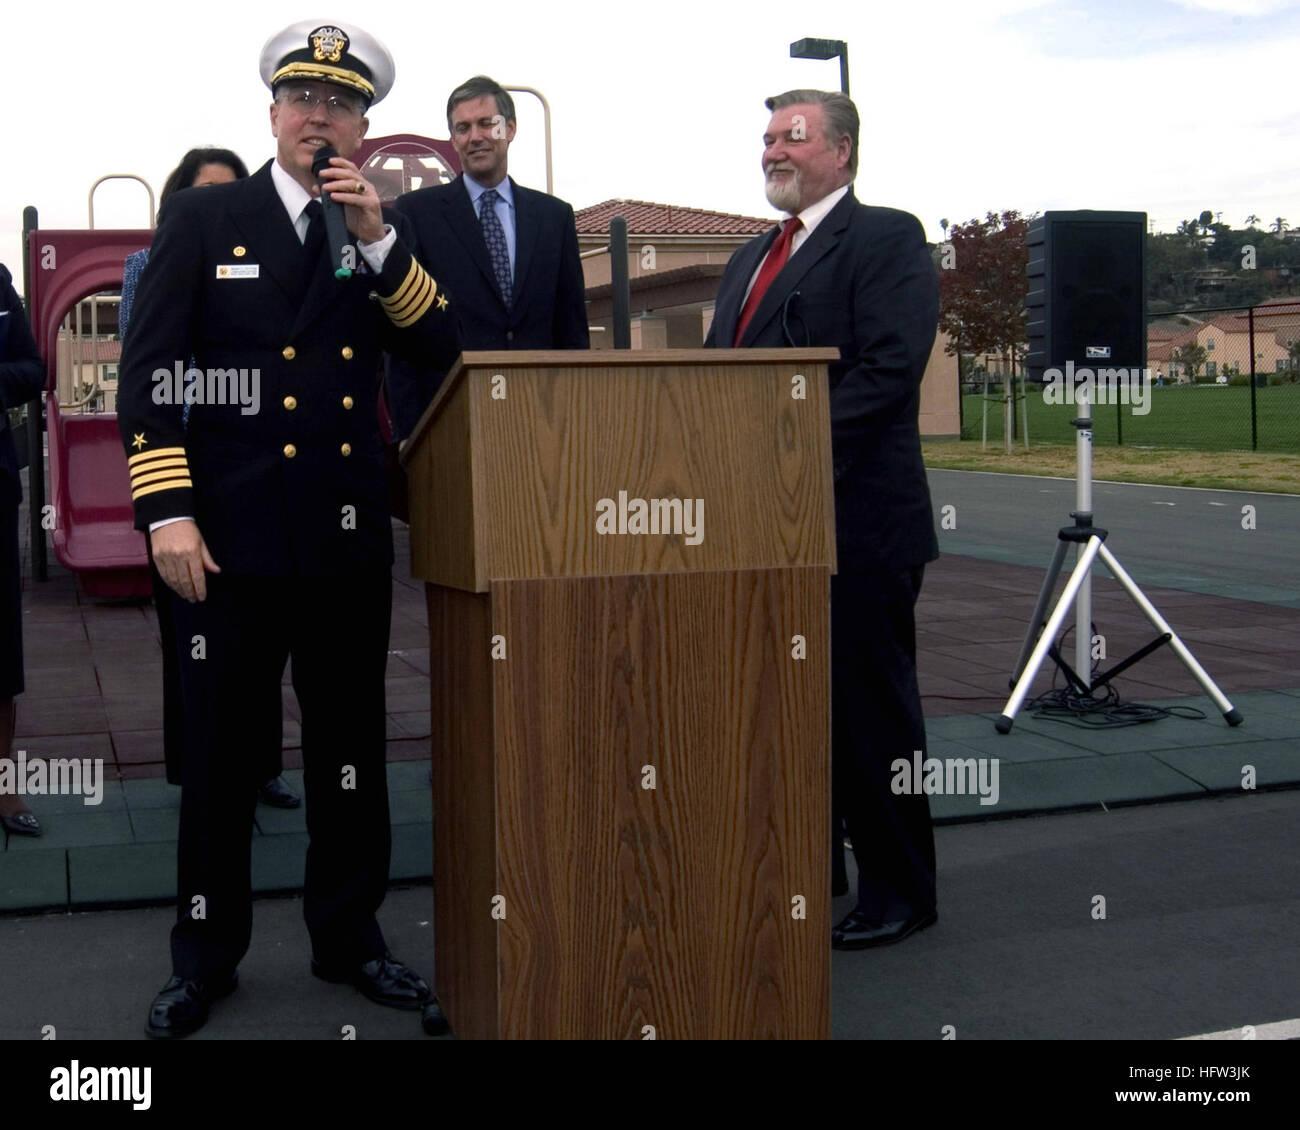 071129-N-8909B-016  SAN DIEGO (Nov. 29, 2007)  Capt. Mark D. Patton, commanding officer of Naval Submarine Base - Stock Image